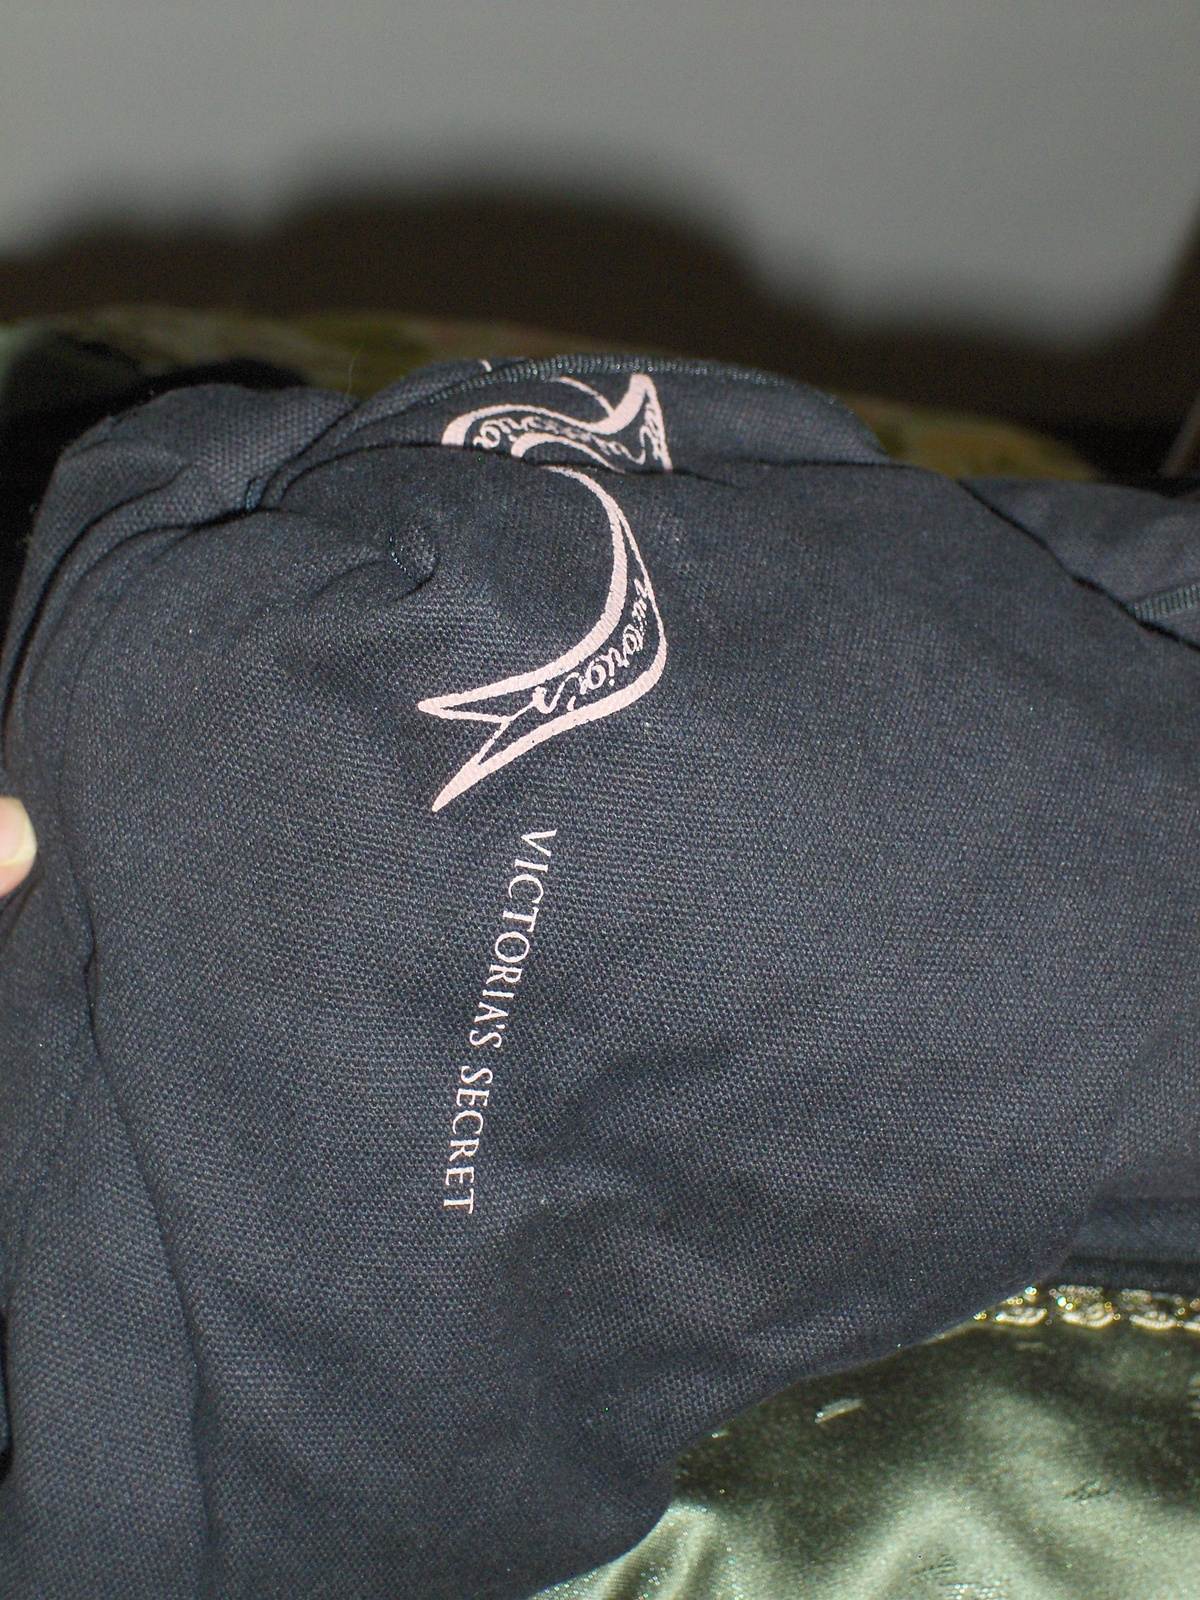 Victoria's Secret Black Friday Tote Bag Shopper Handbag Satchel Purse Overnight